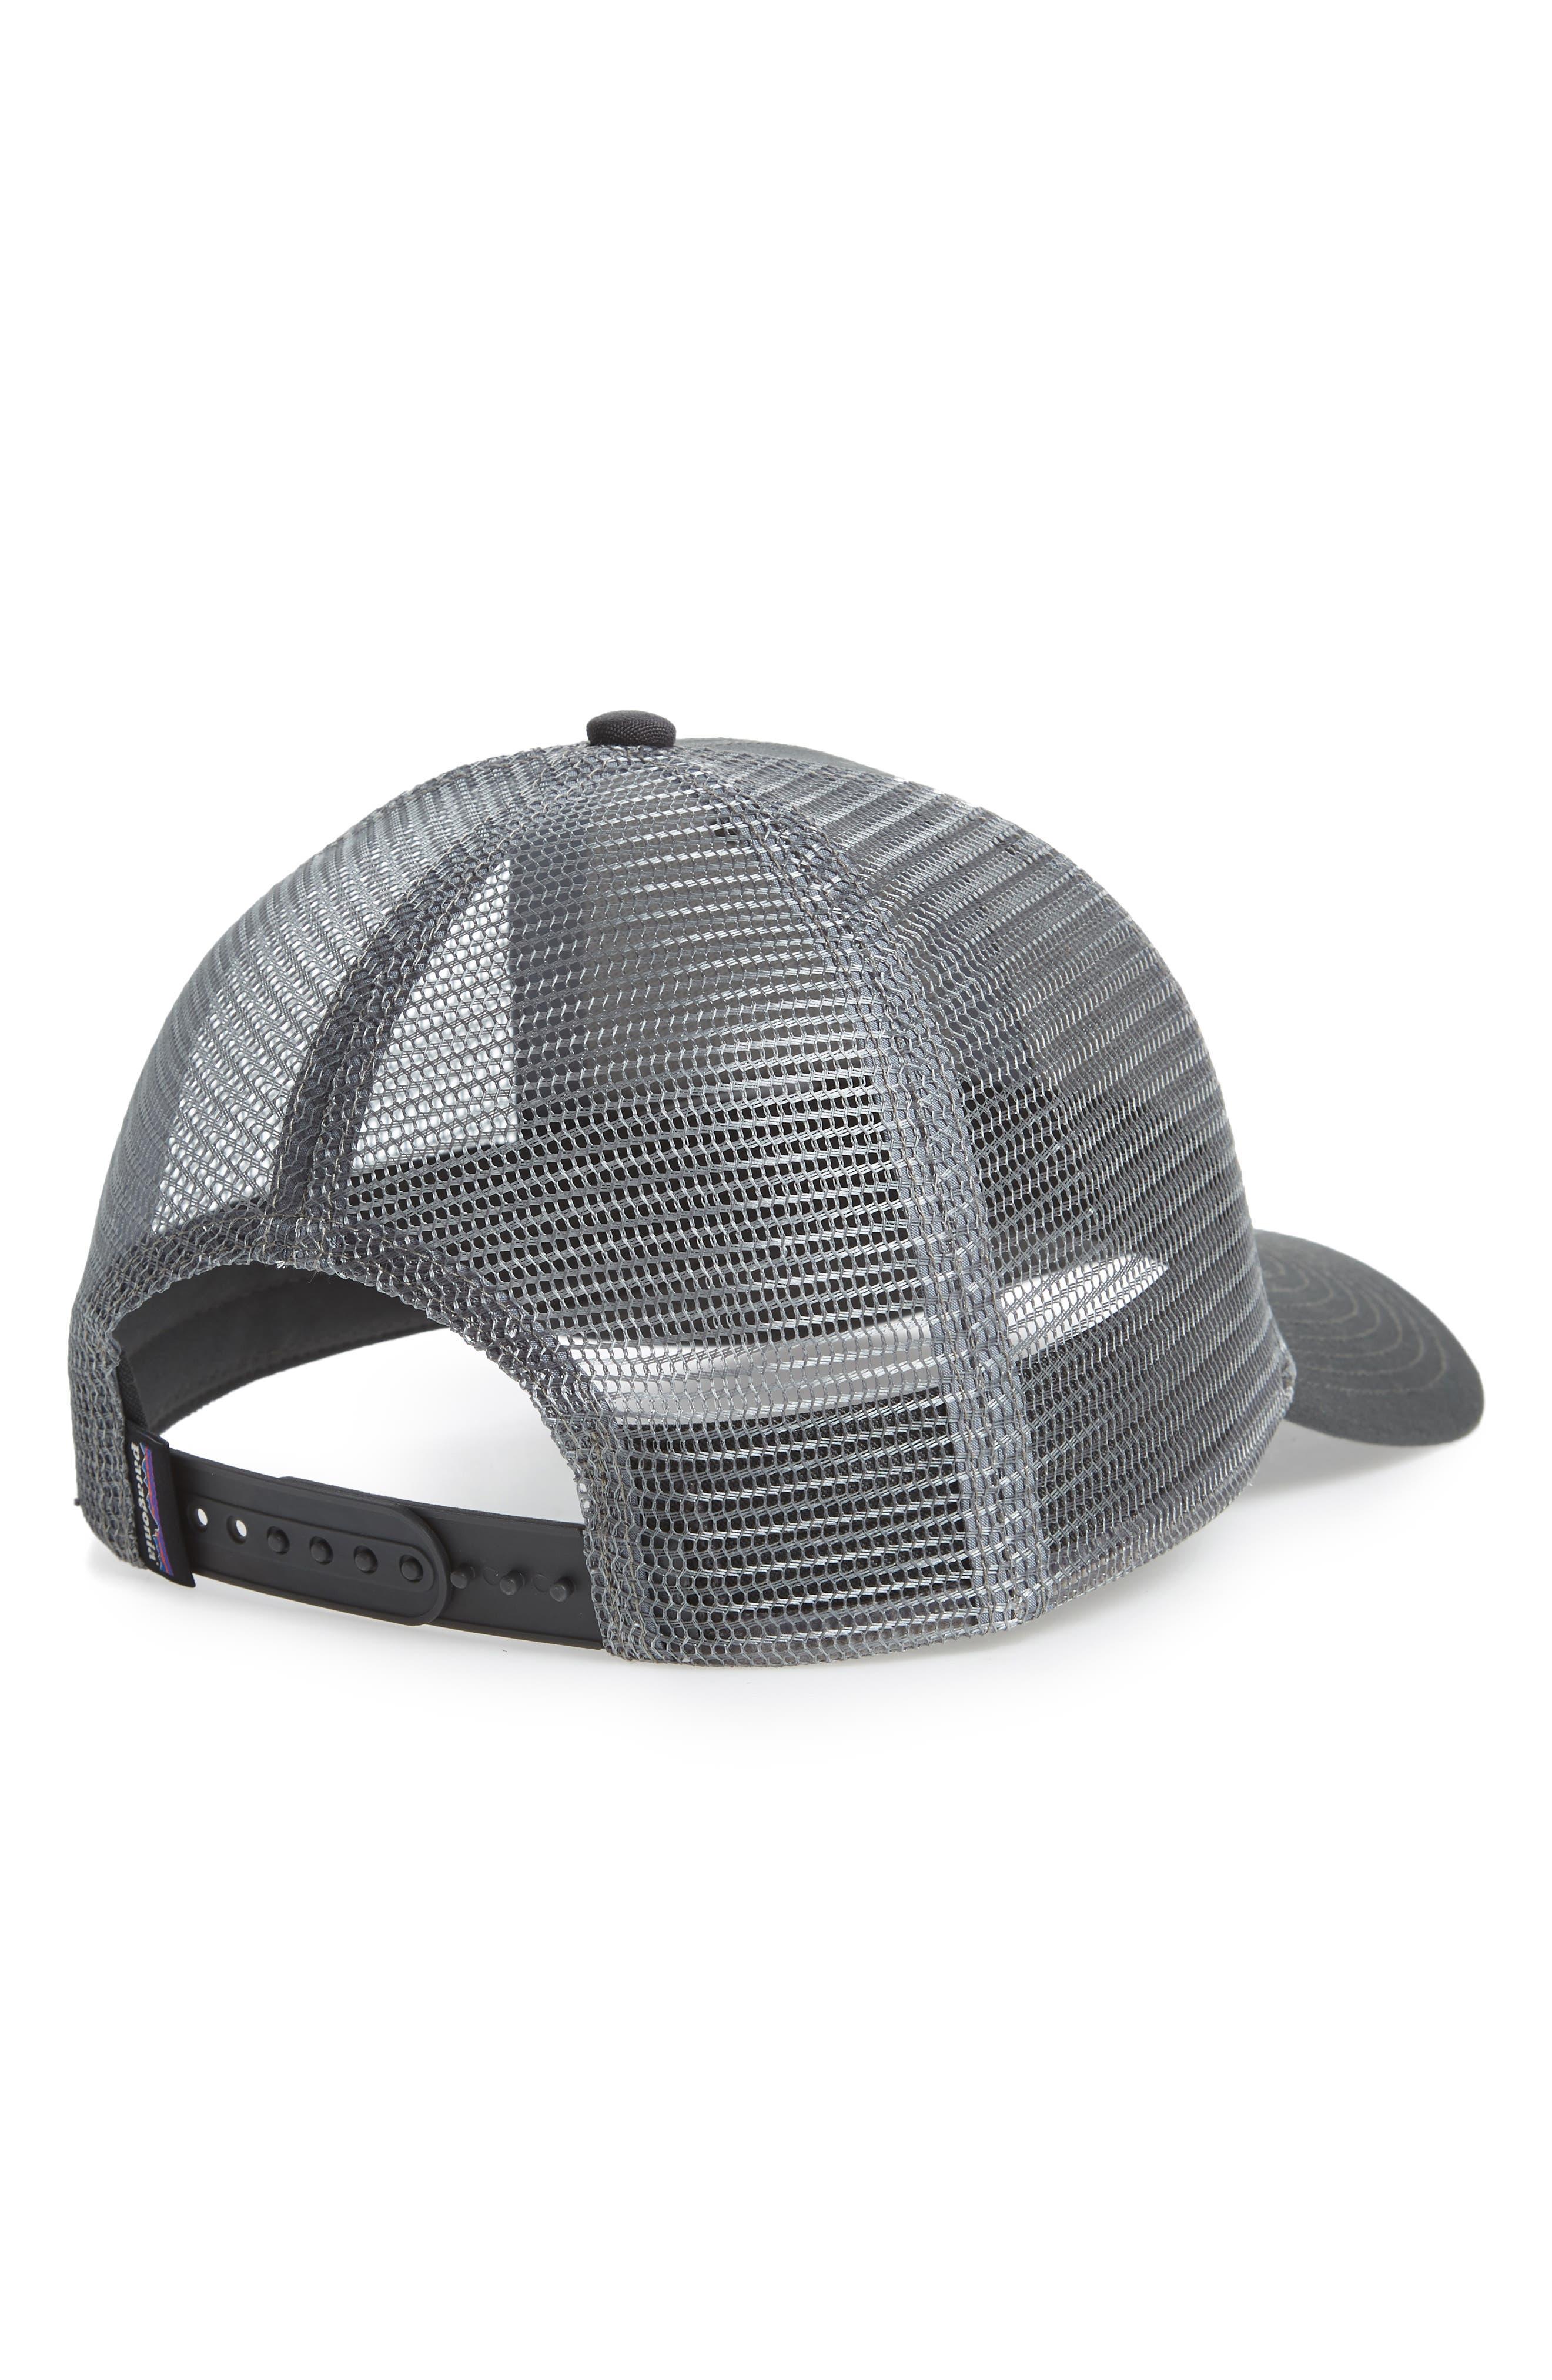 Shop Sticker Trucker Hat,                             Alternate thumbnail 2, color,                             Forge Grey